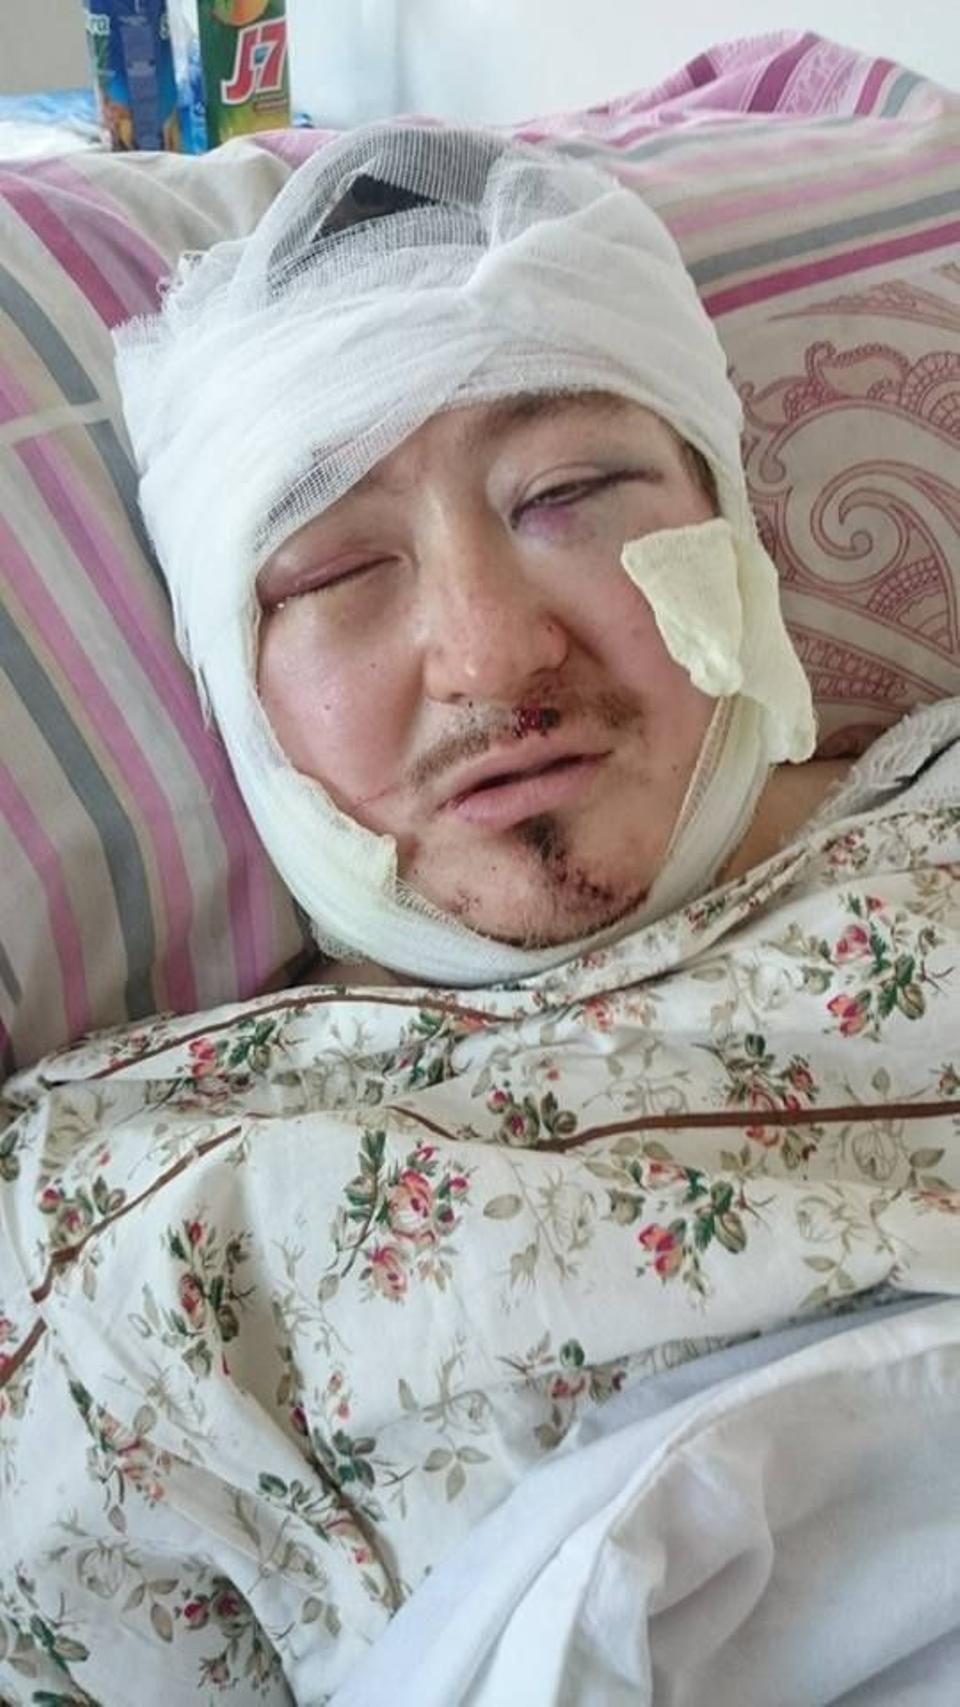 Kadyr Malikov in hospital after the attack. (TRT World)